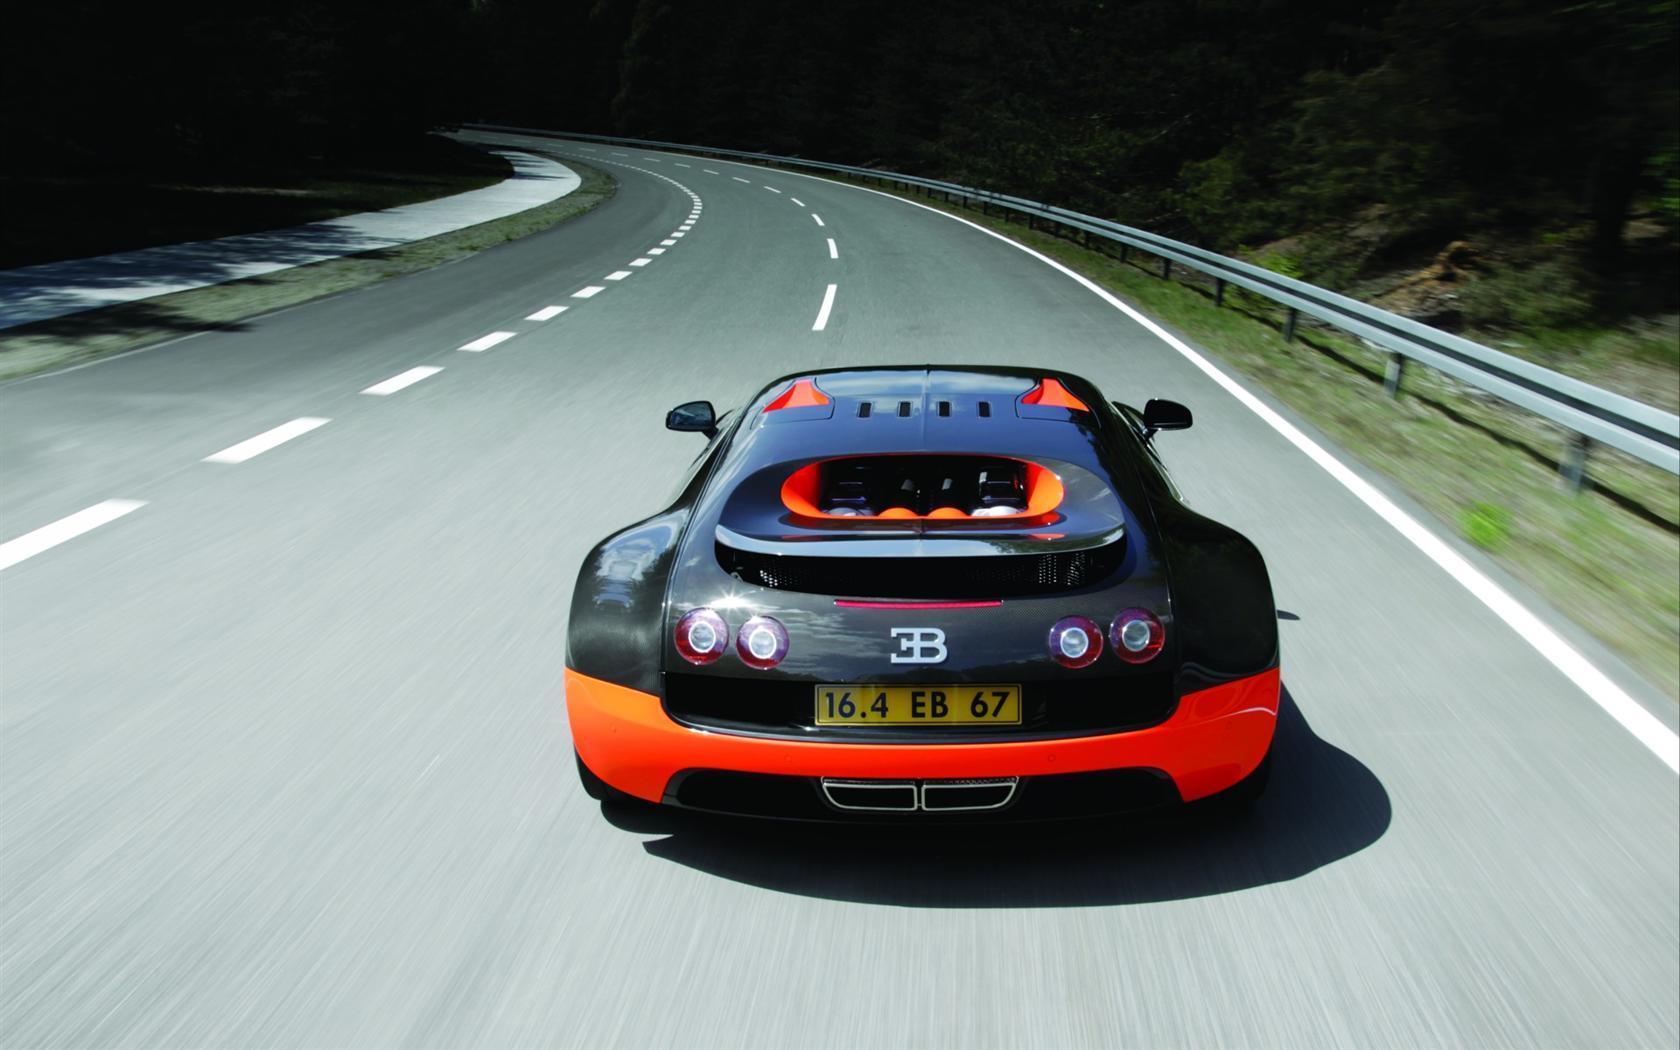 wallpapers for bugatti veyron 164 super sport wallpaper - Bugatti Veyron Super Sport Top Gear Wallpaper